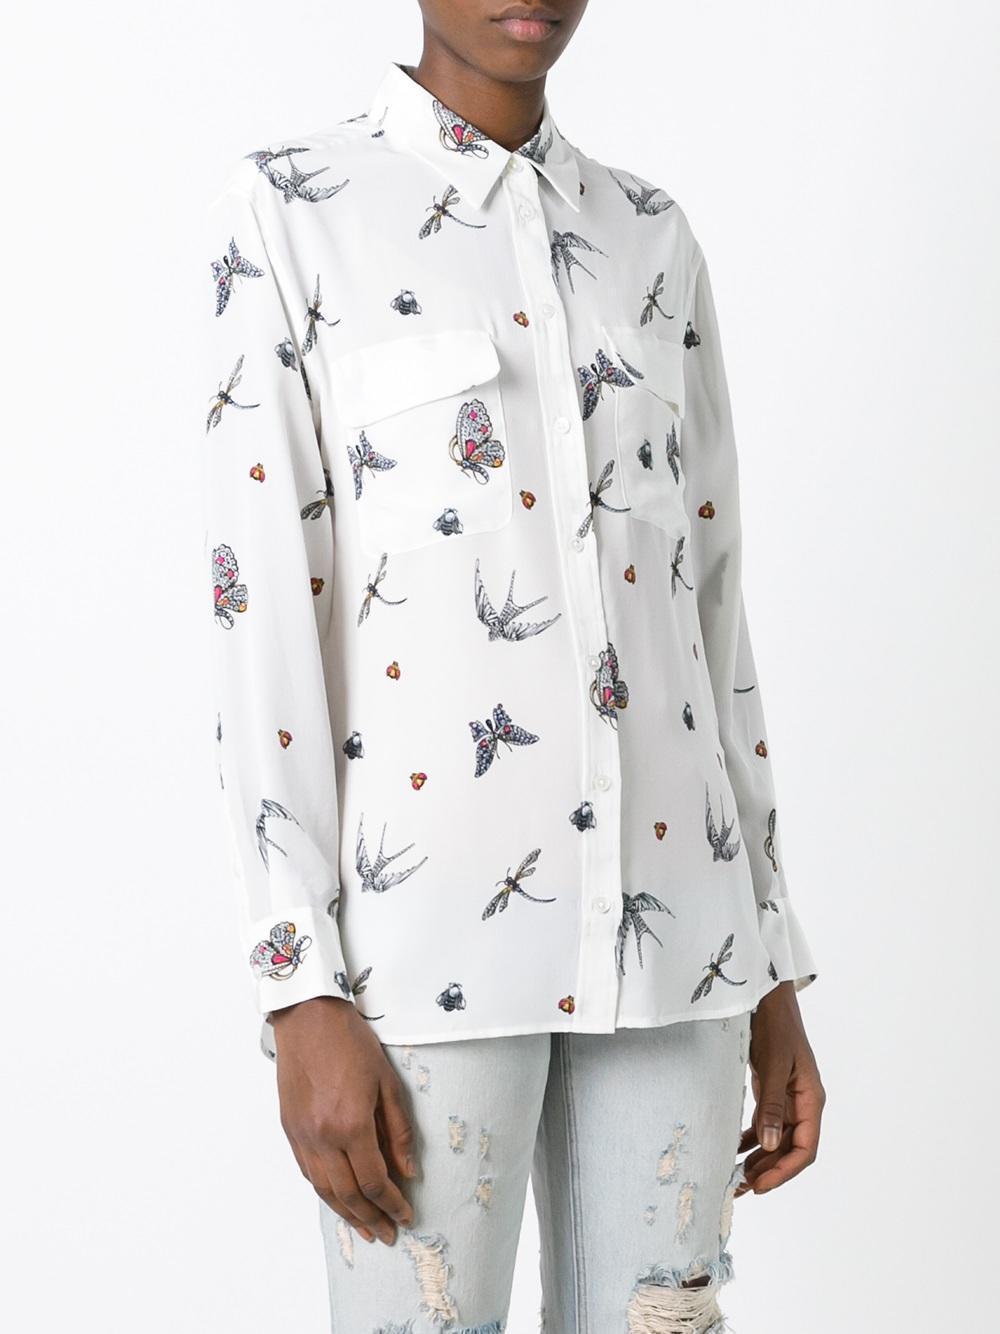 Lyst Equipment Bug Print Shirt in White